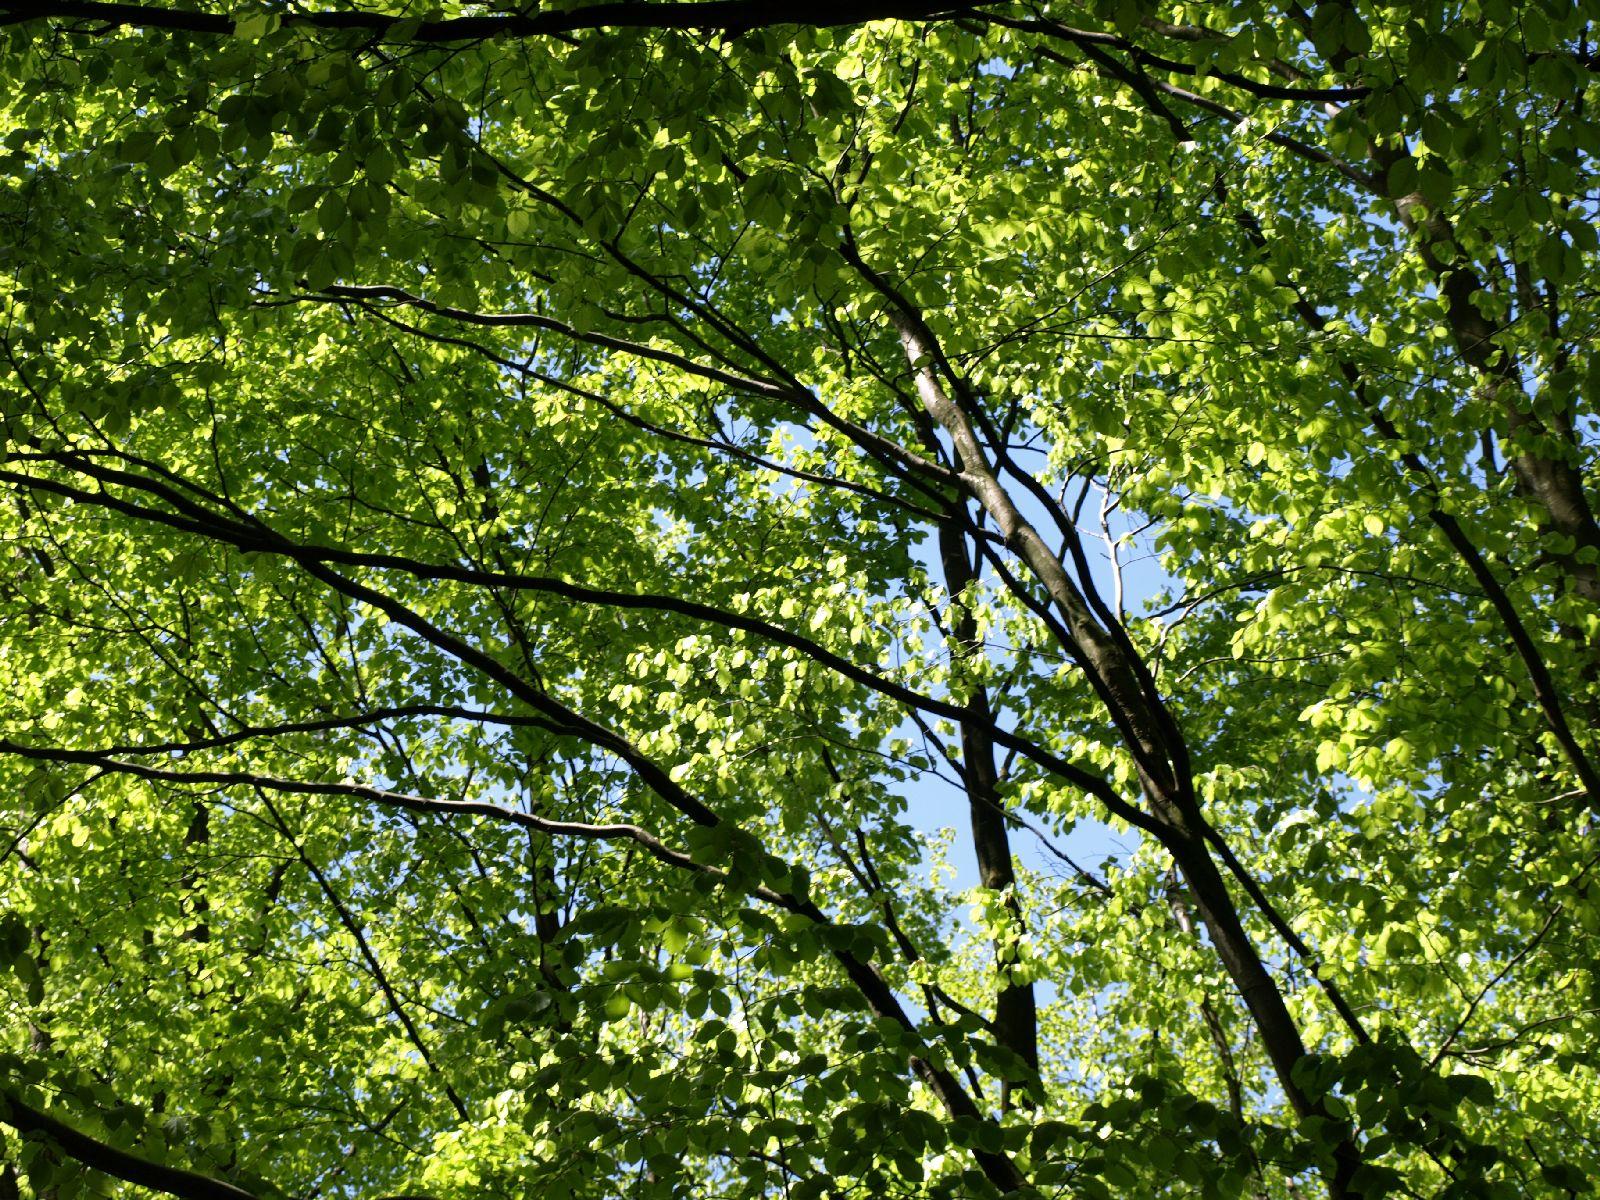 Pflanzen-Baum-Foto_Textur_B_P5042460